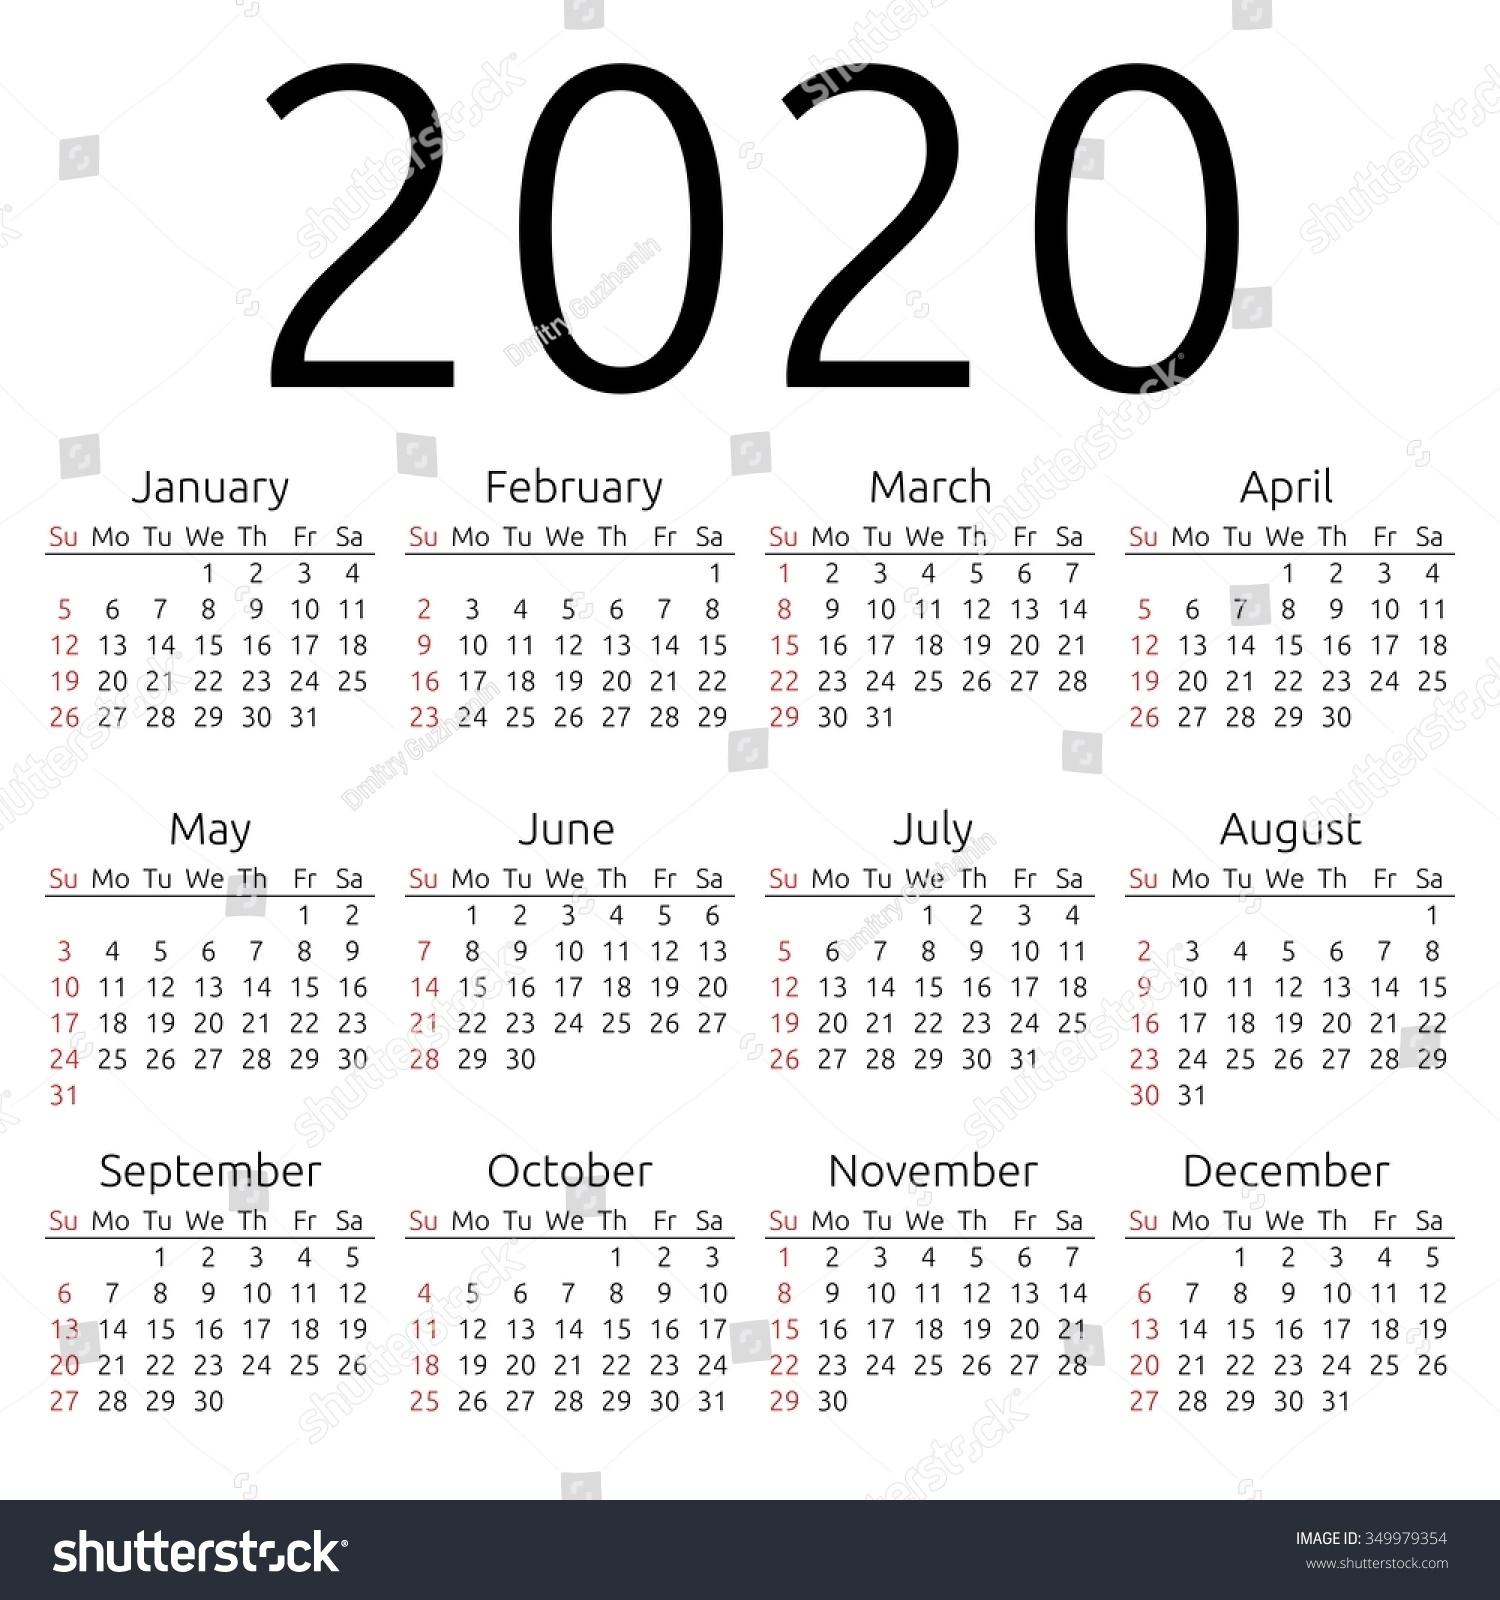 Week Number Calendar 2020 | 2020 Calendar